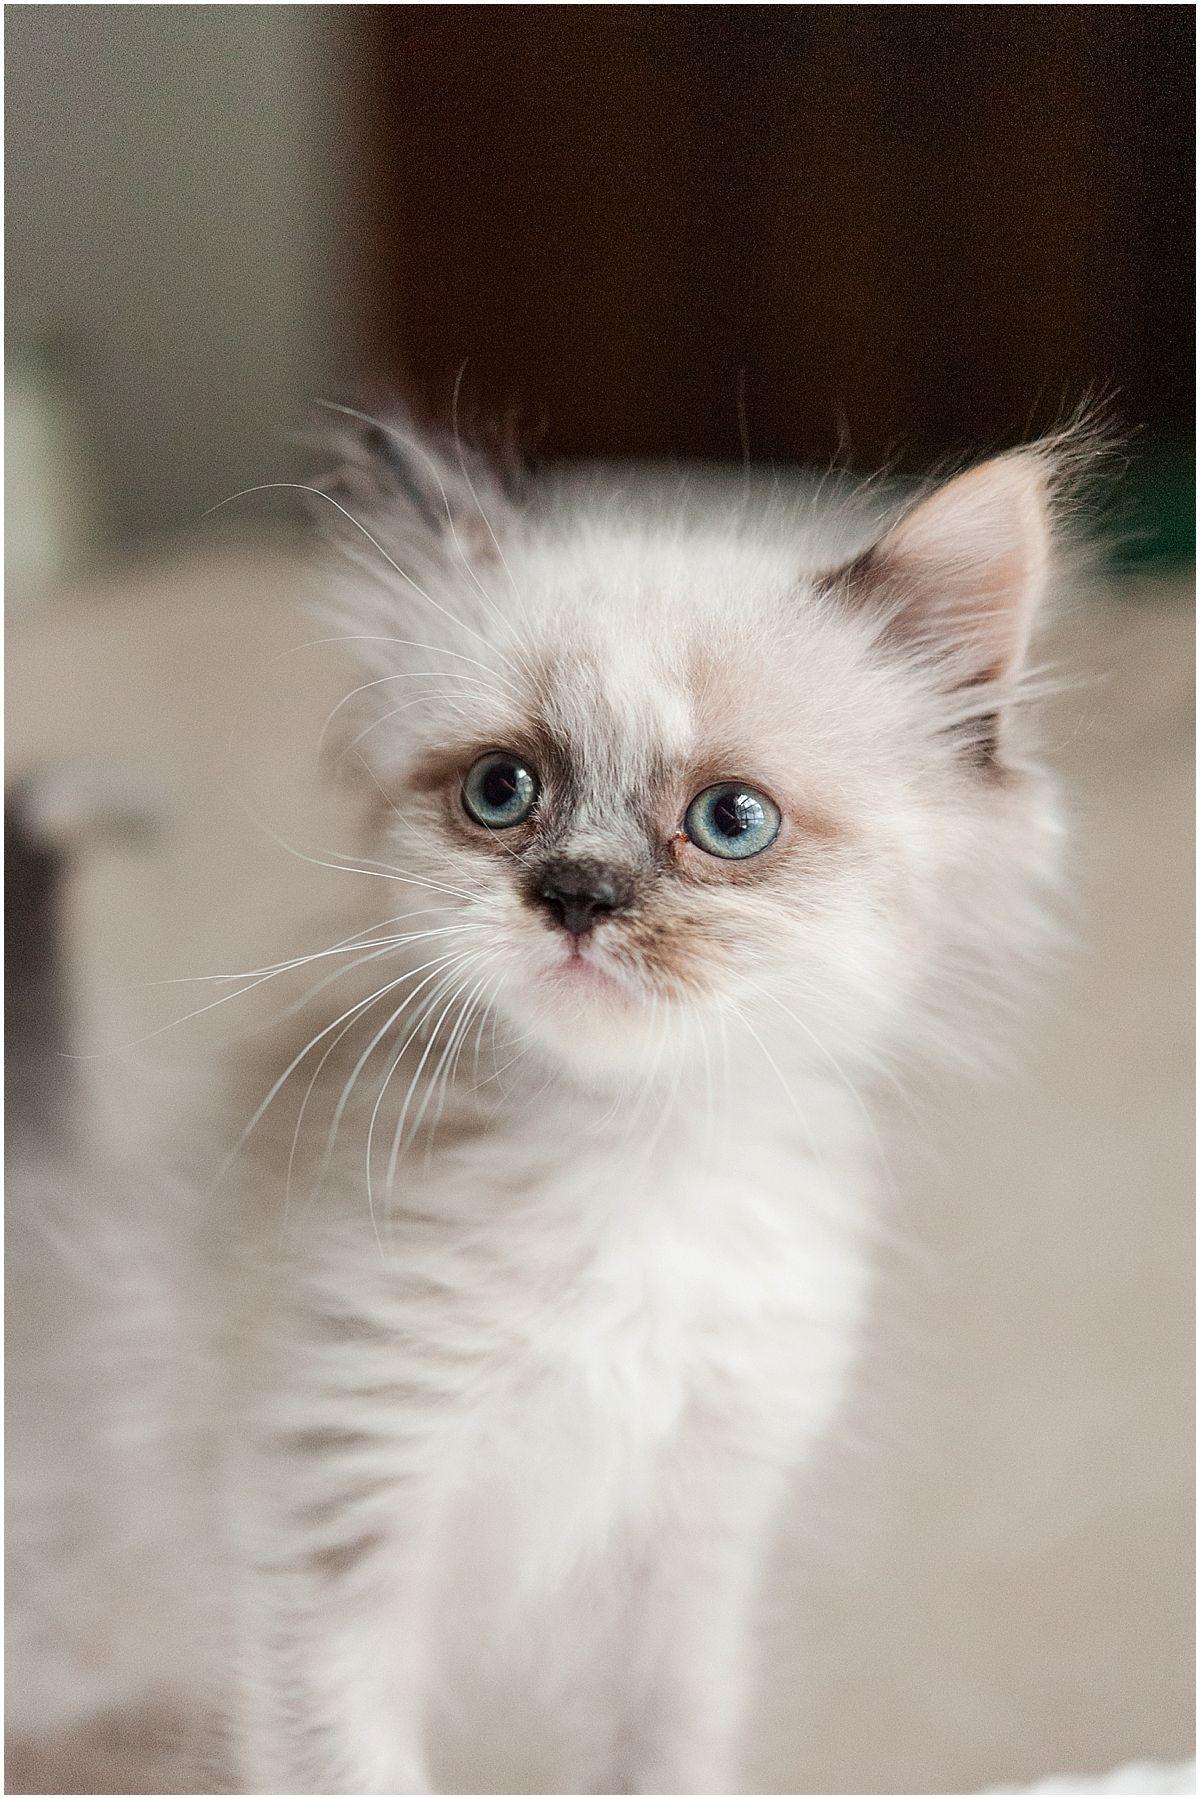 Ragamuffin Kitten Columbus Ohio Krista Piper Ragamuffin